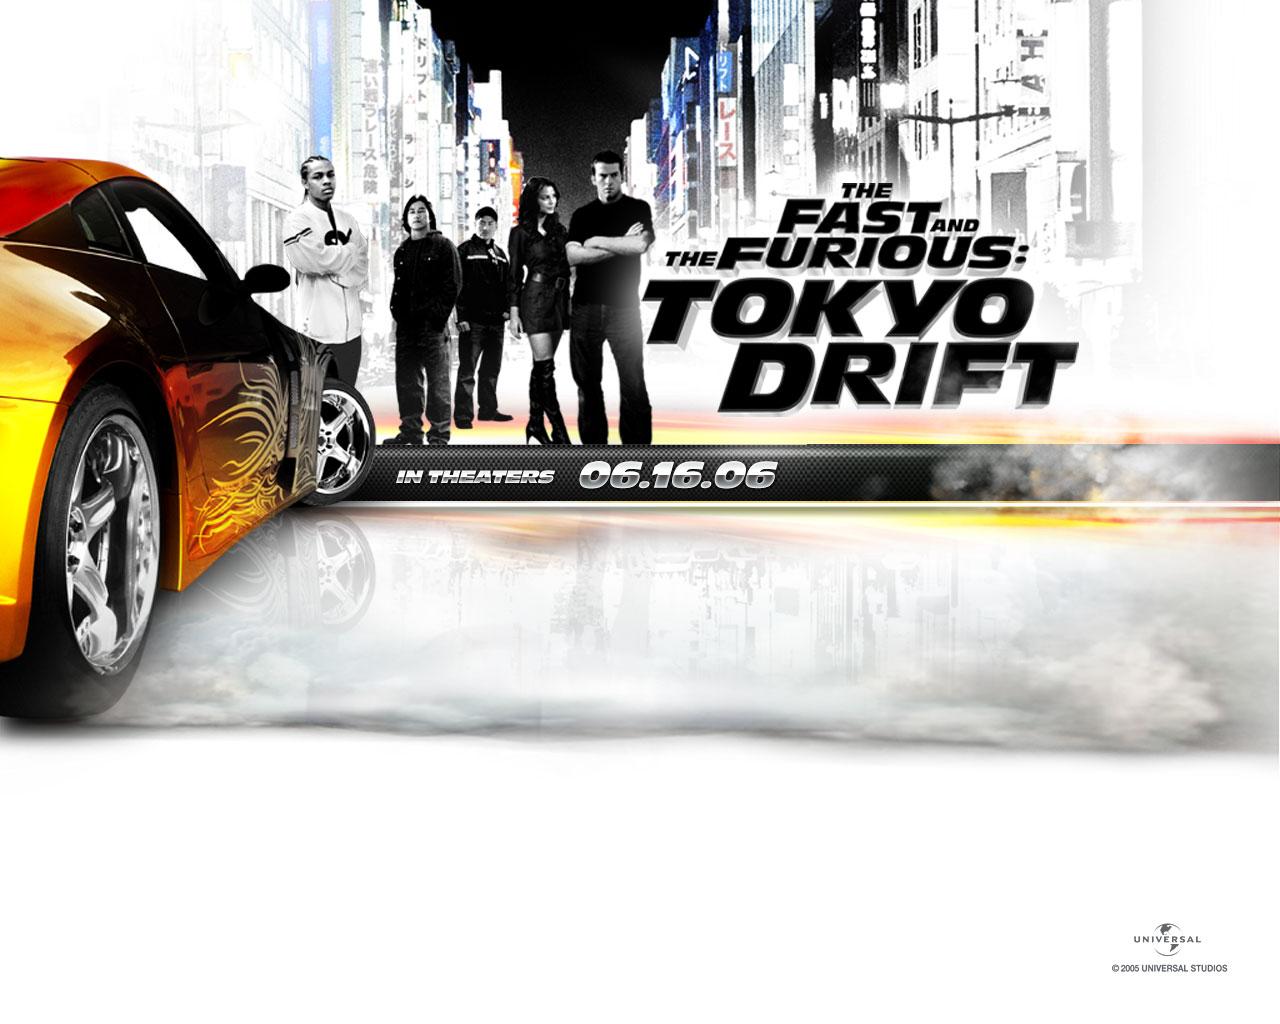 The fast and the furious: tokyo drift | movie fanart | fanart. Tv.